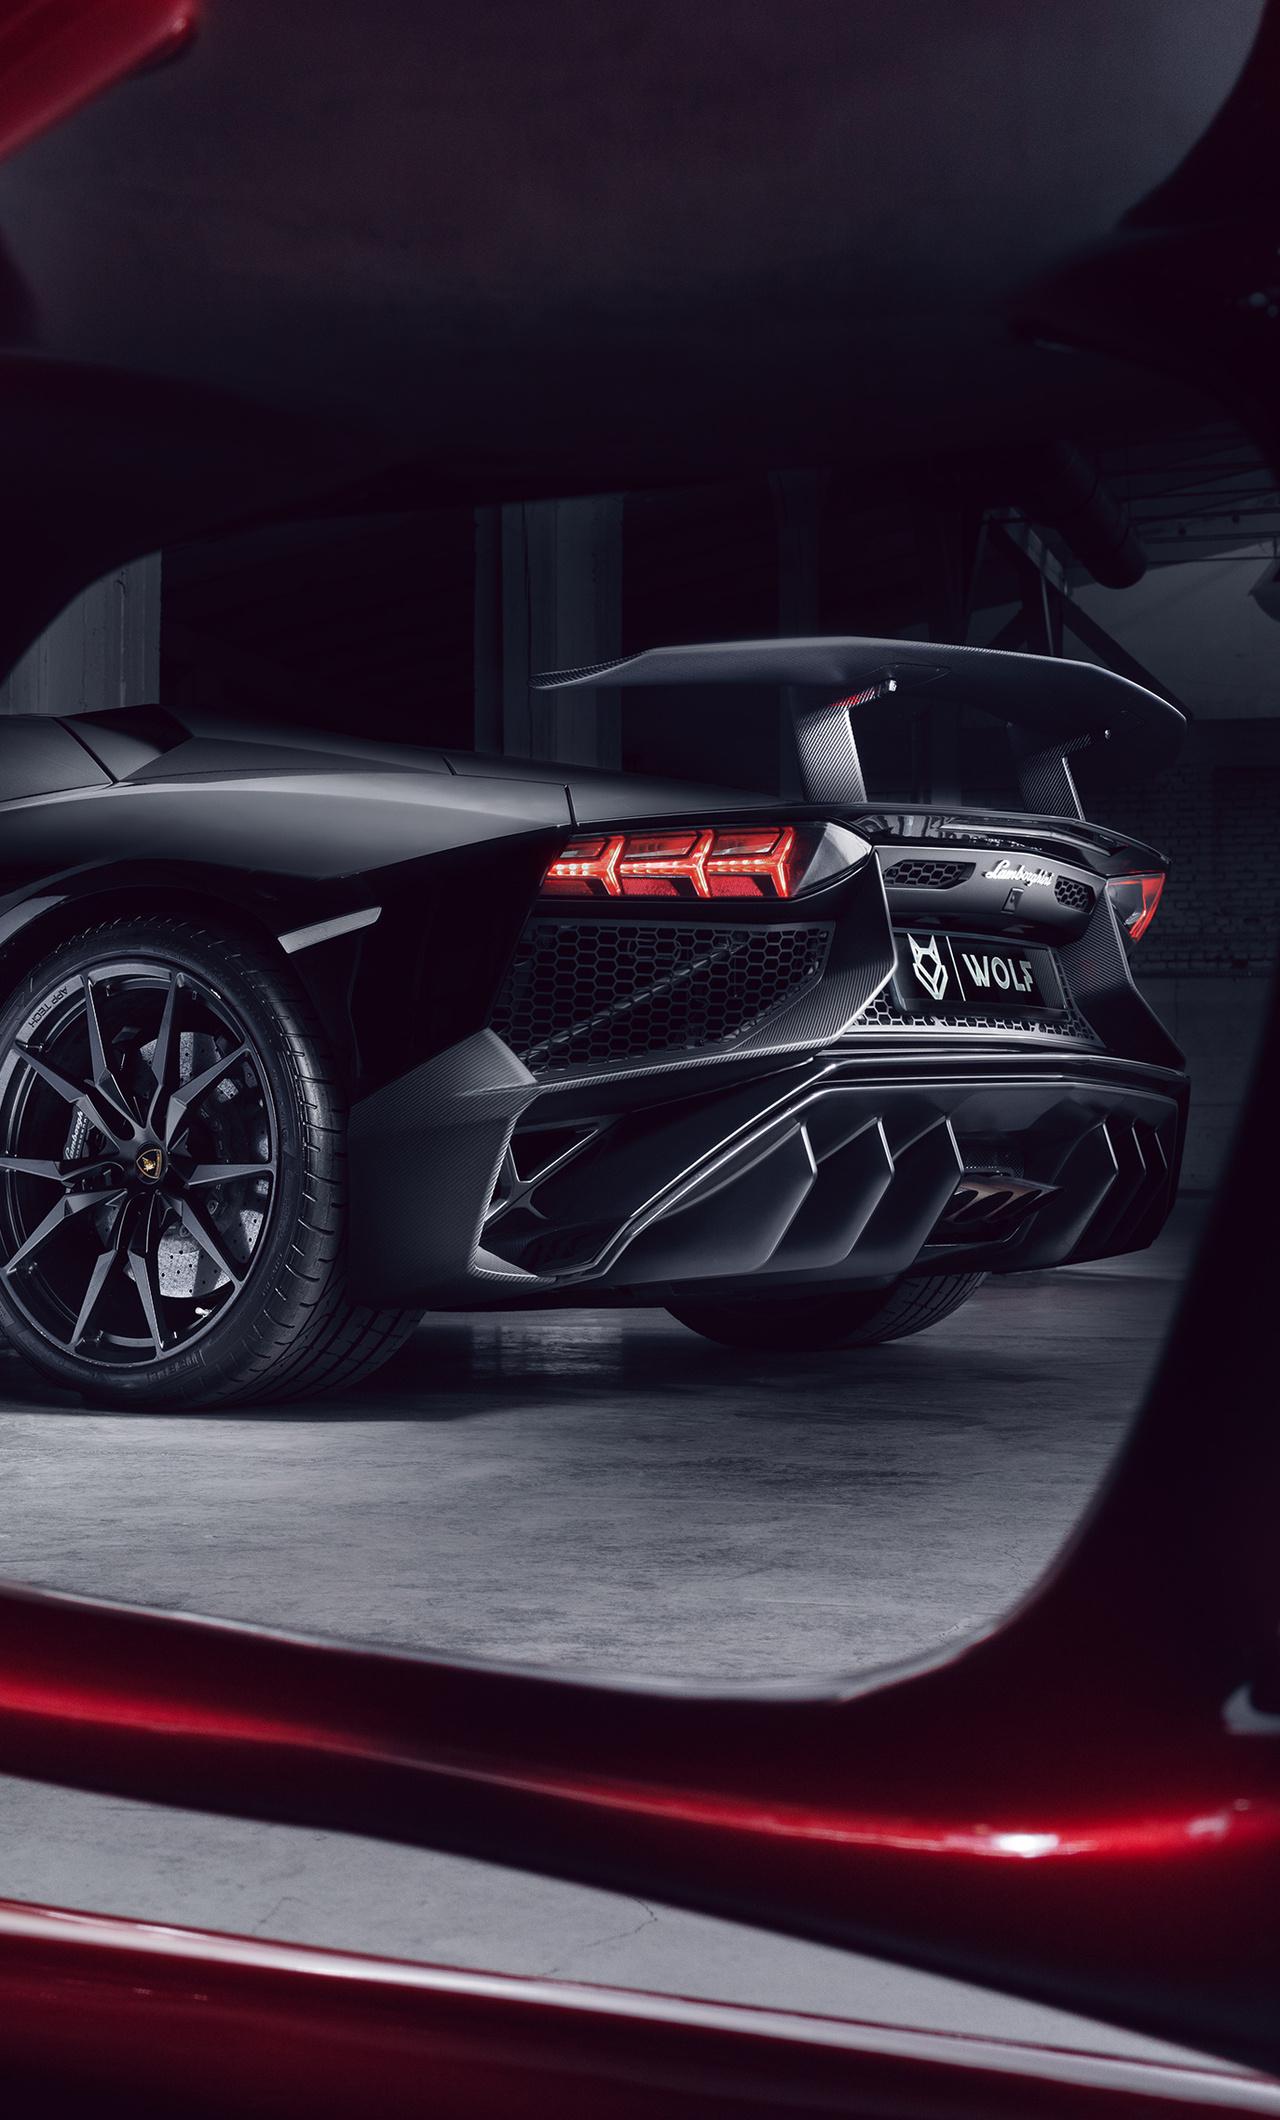 1280x2120 Lamborghini Aventador Black Red Wolf 4k Iphone 6 Hd 4k